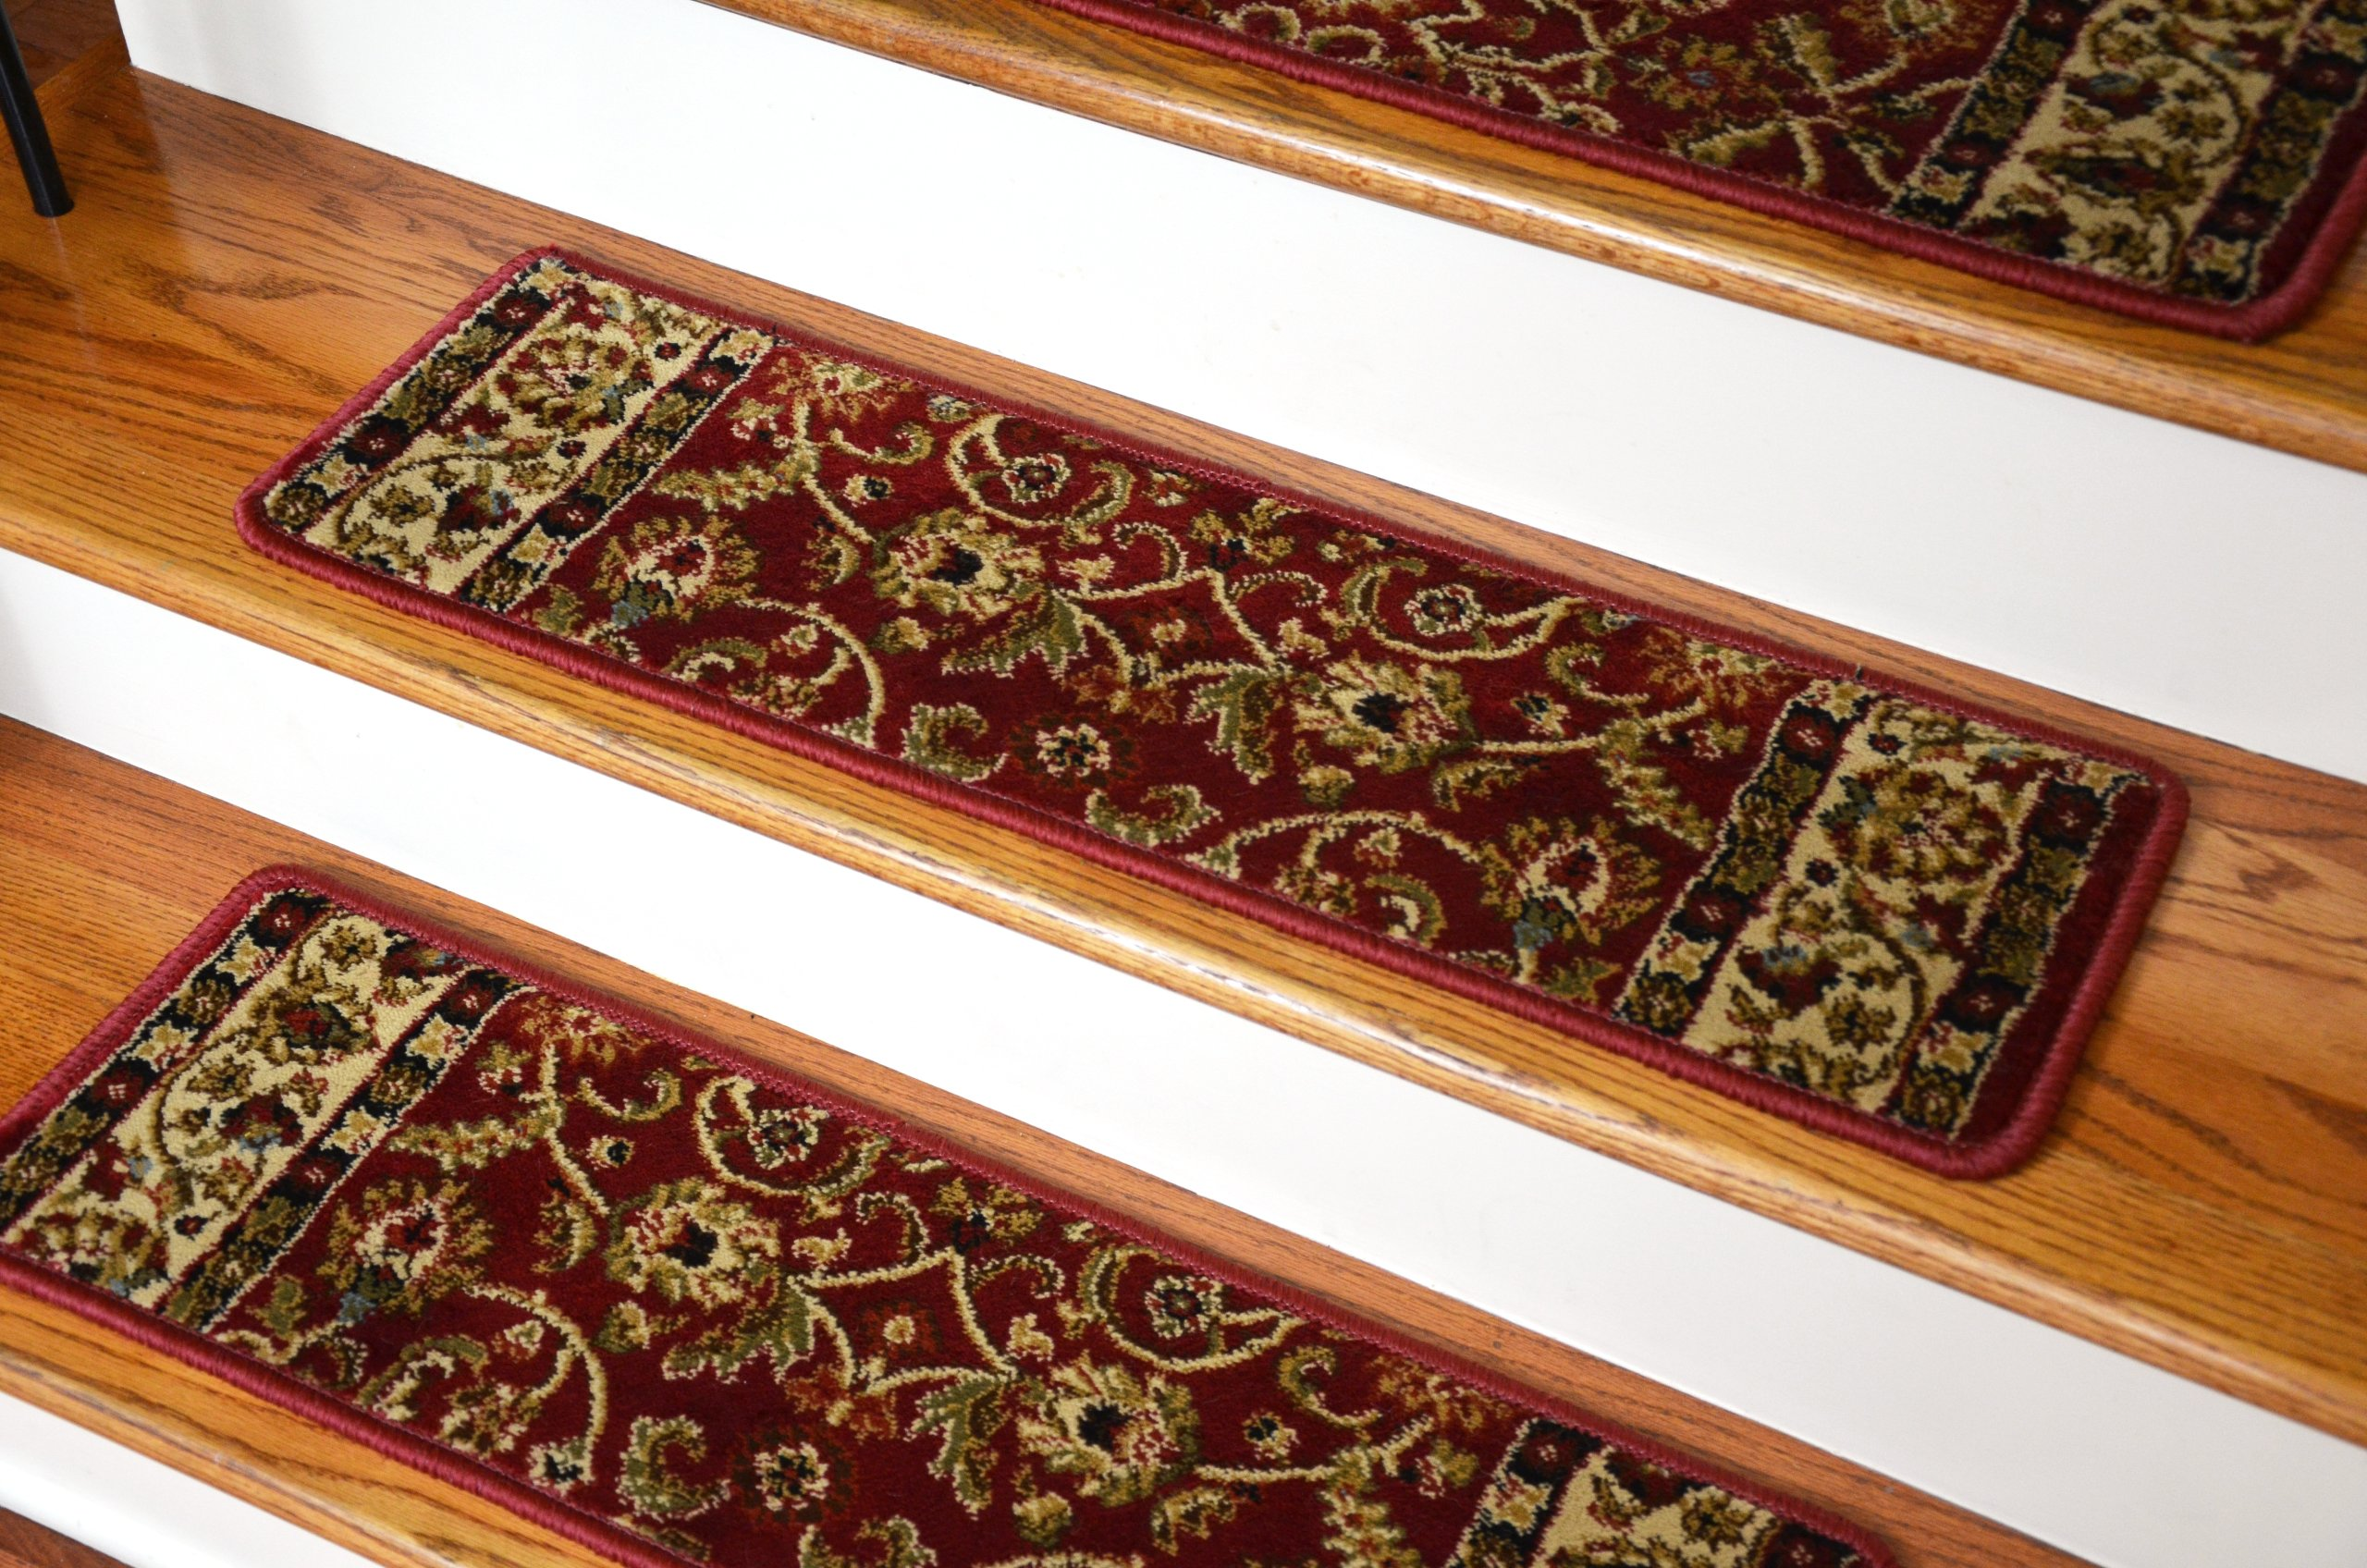 Dean Premium Carpet Stair Treads - Classic Keshan Claret Red Rug Runners 31''W Set of 13 by Dean Flooring Company